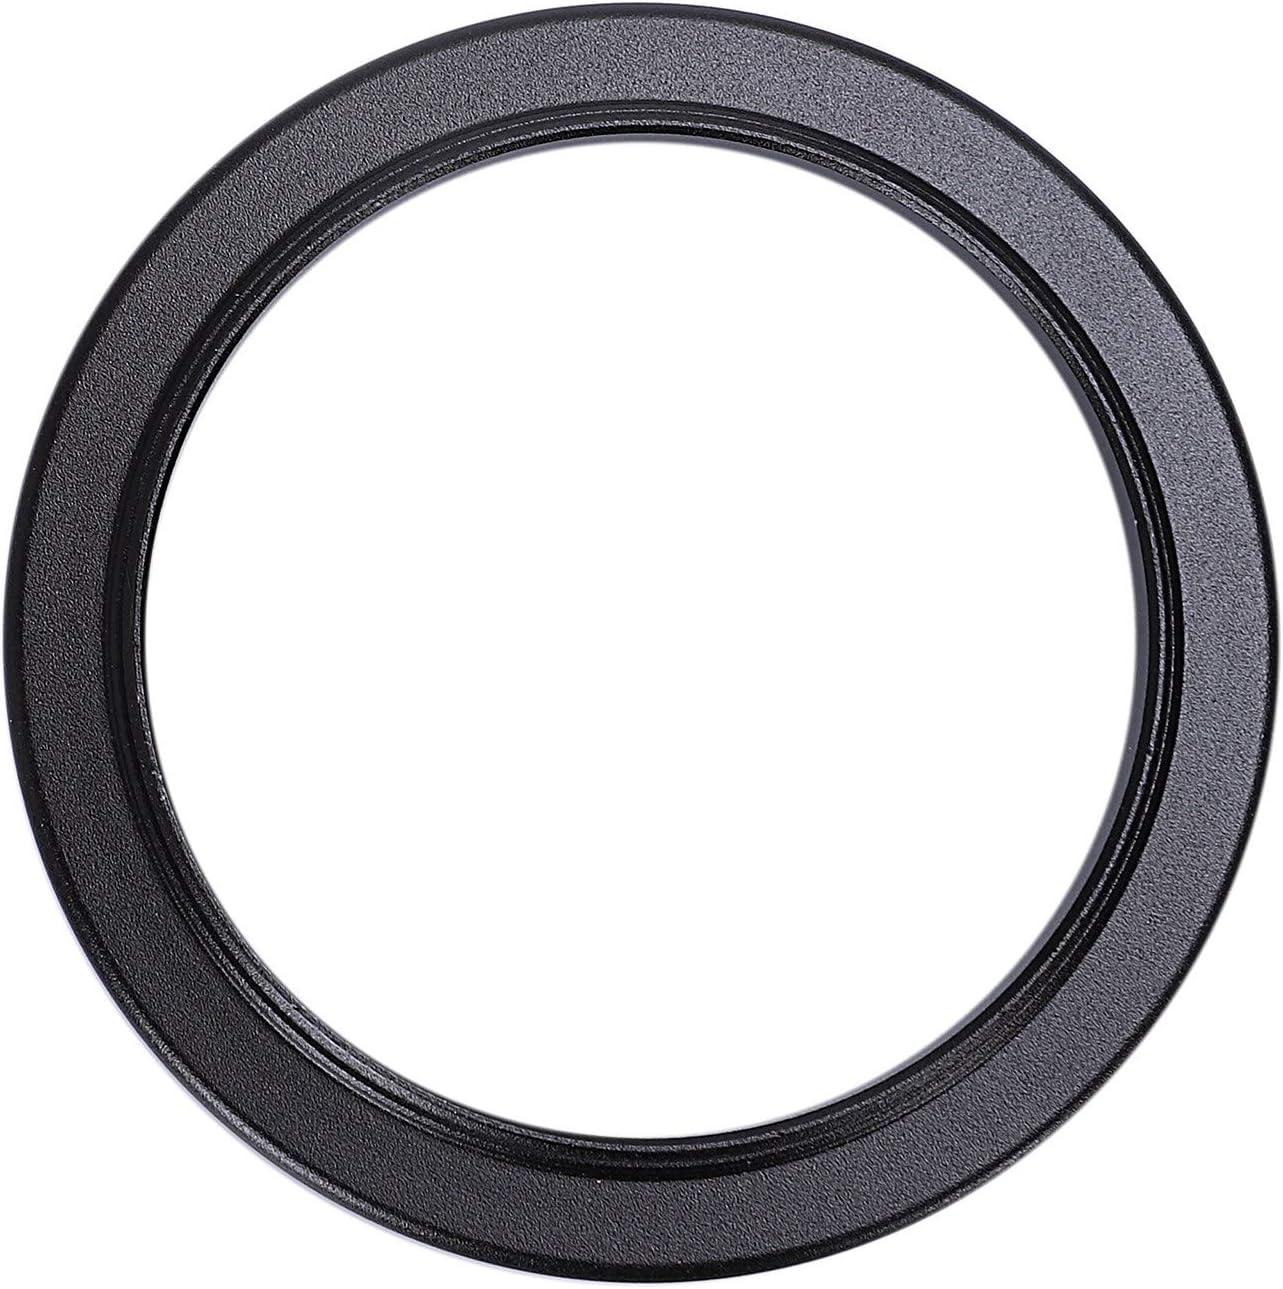 Semoic 49mm Mount Standard Metal Lens Hood for Canon Nikon Pentax Olympus